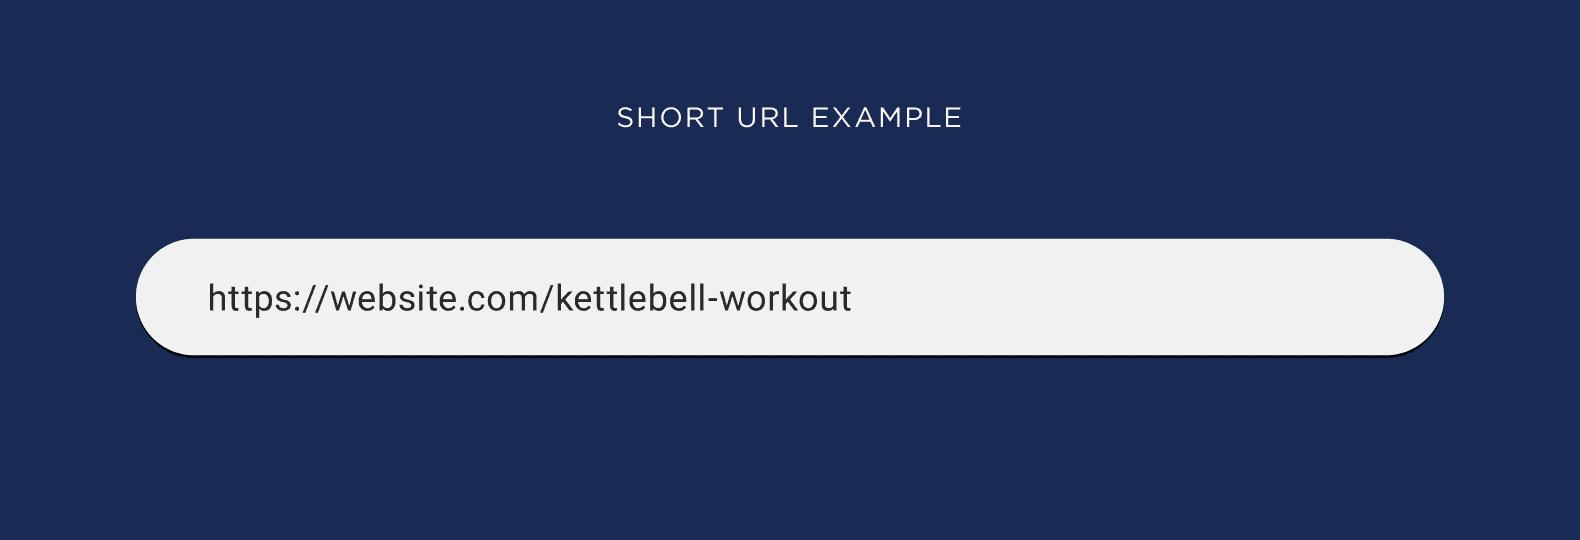 Short URL example